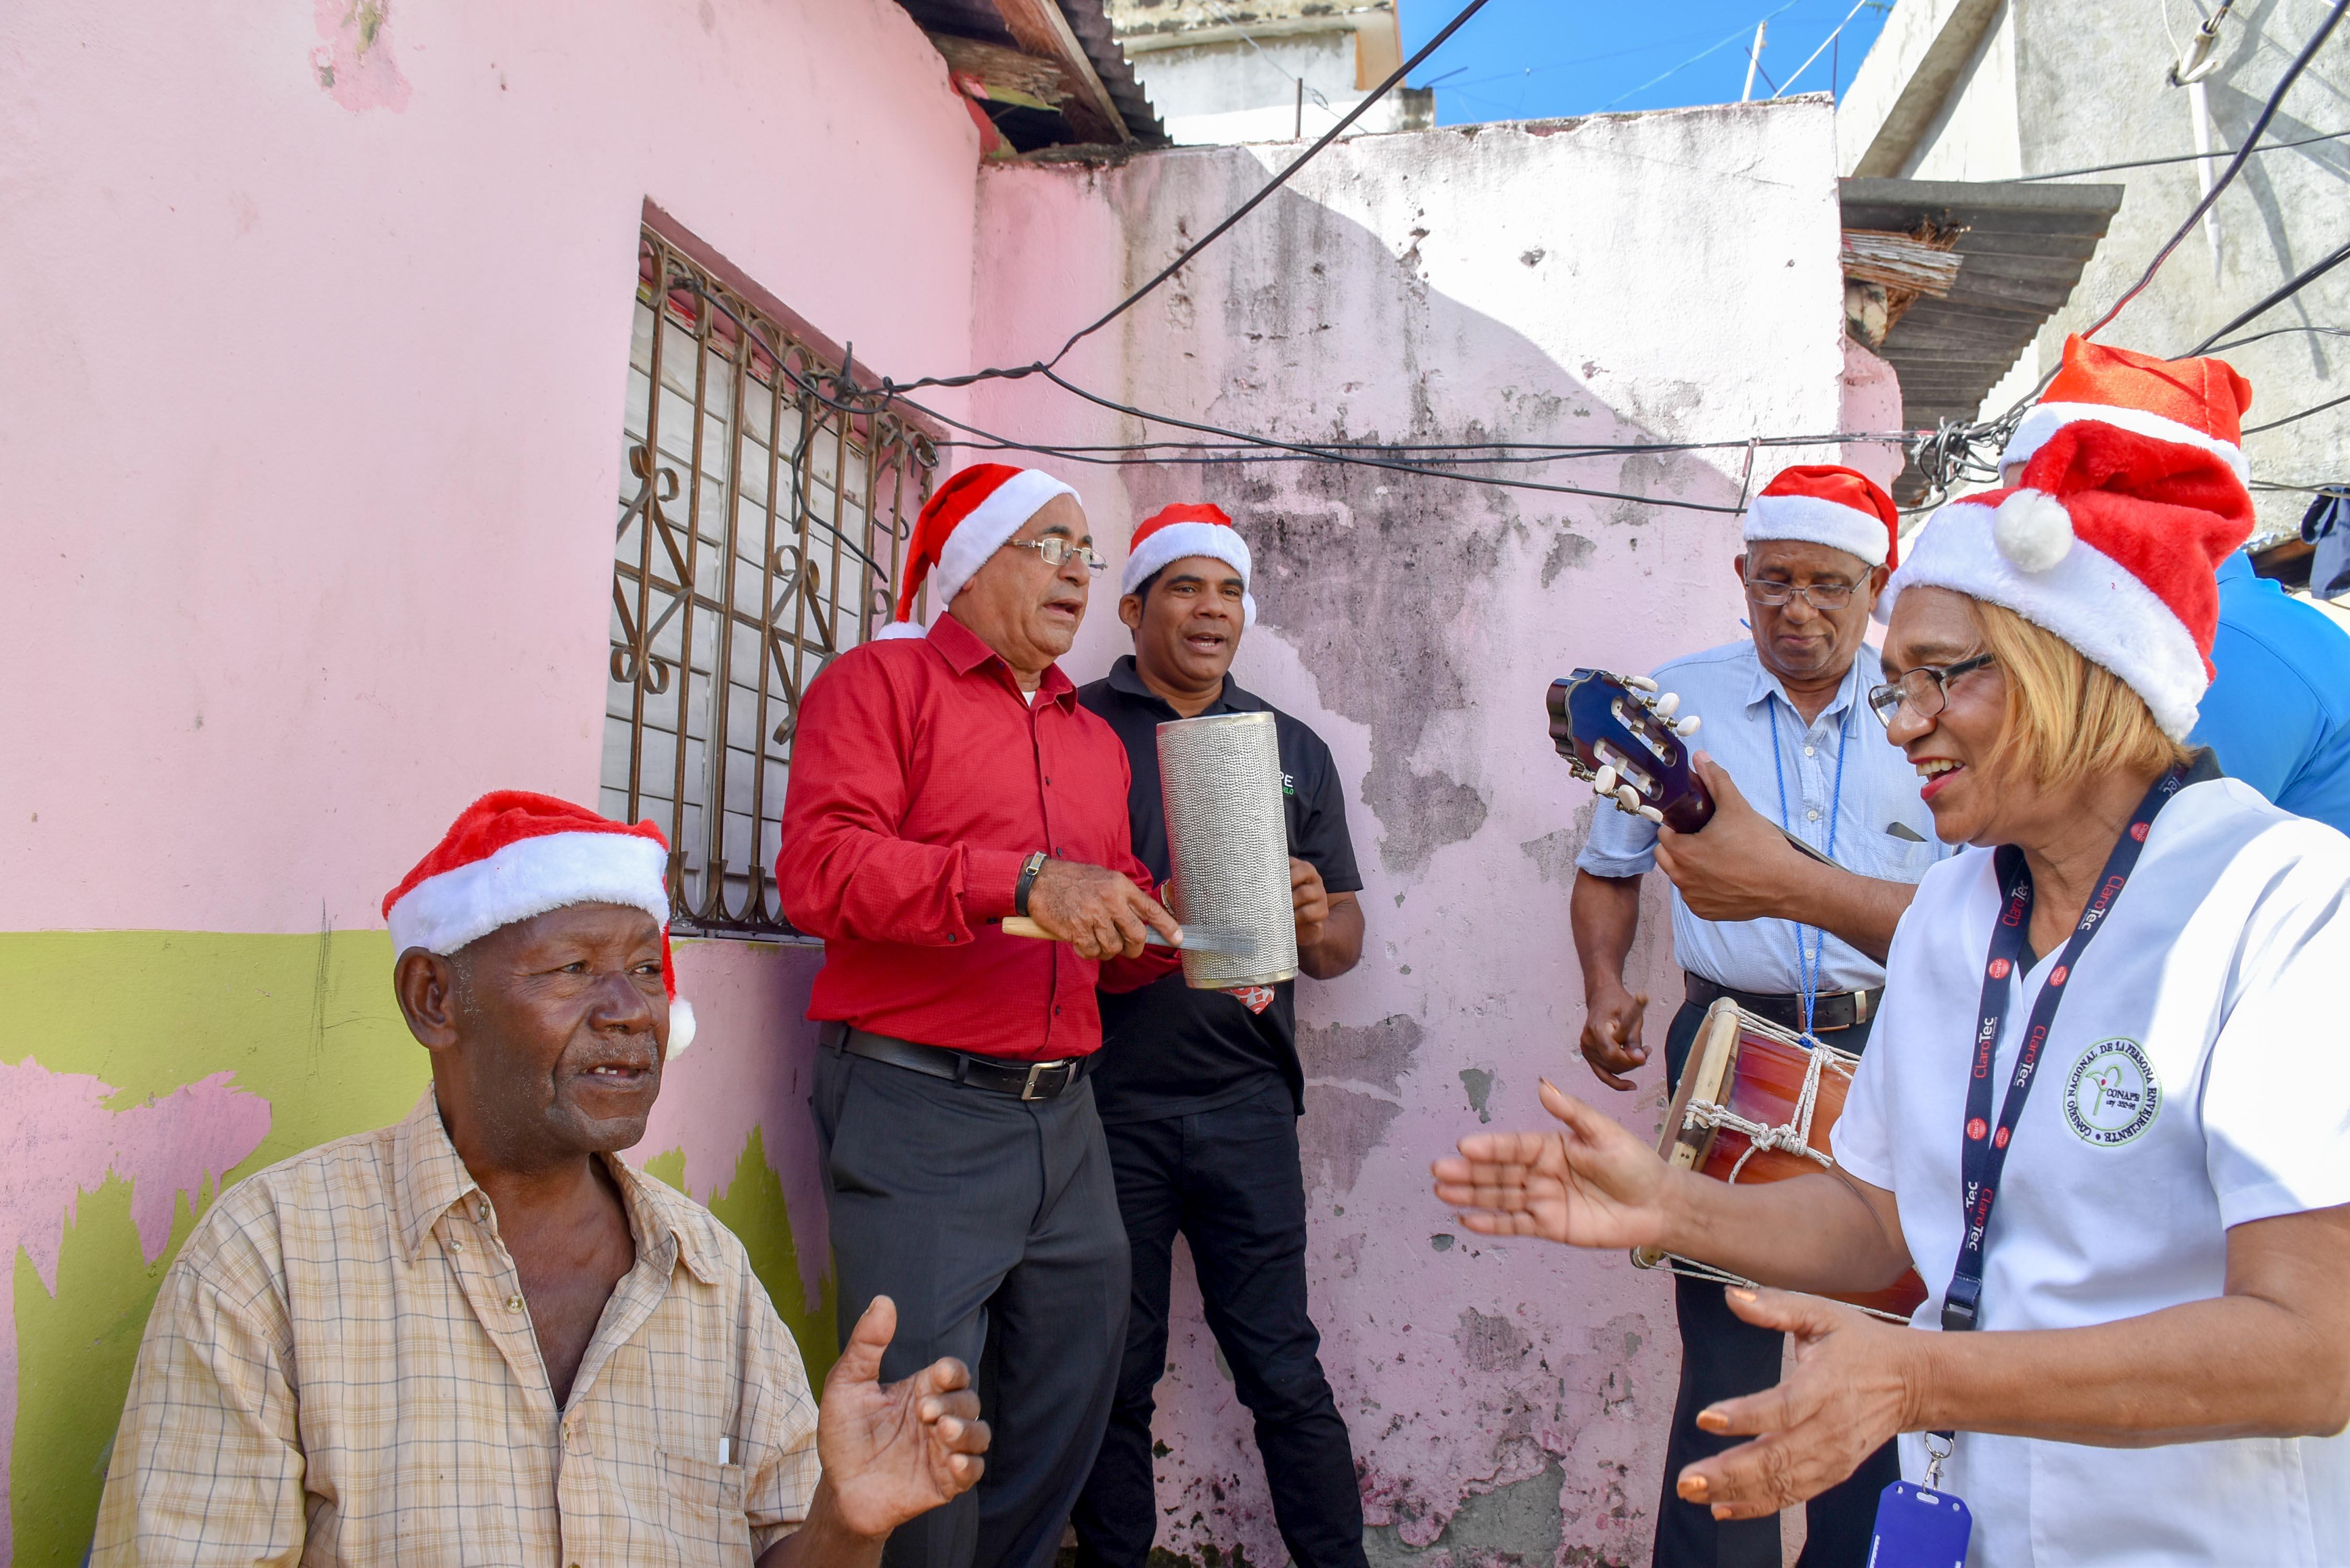 Sorprenden a adultos mayores con aguinaldos navideños en sectores de la capital